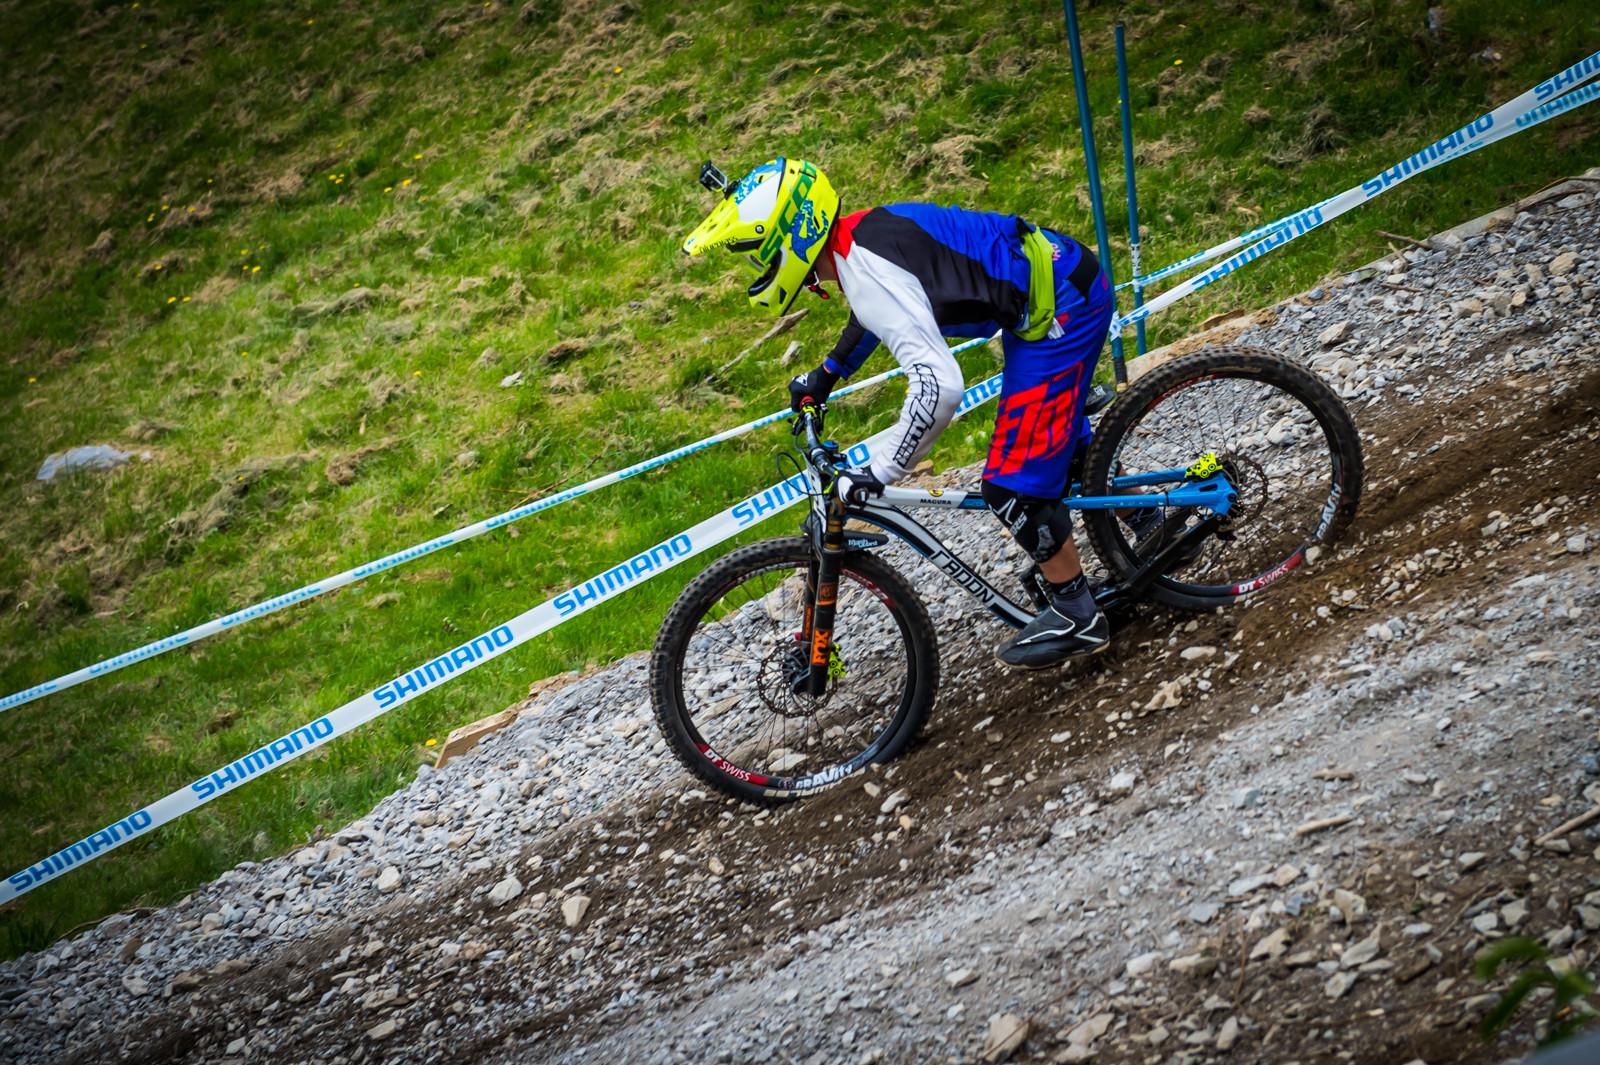 Radon G-Out Project - Lourdes World Cup - G-Out Project - Lourdes World Cup - Mountain Biking Pictures - Vital MTB